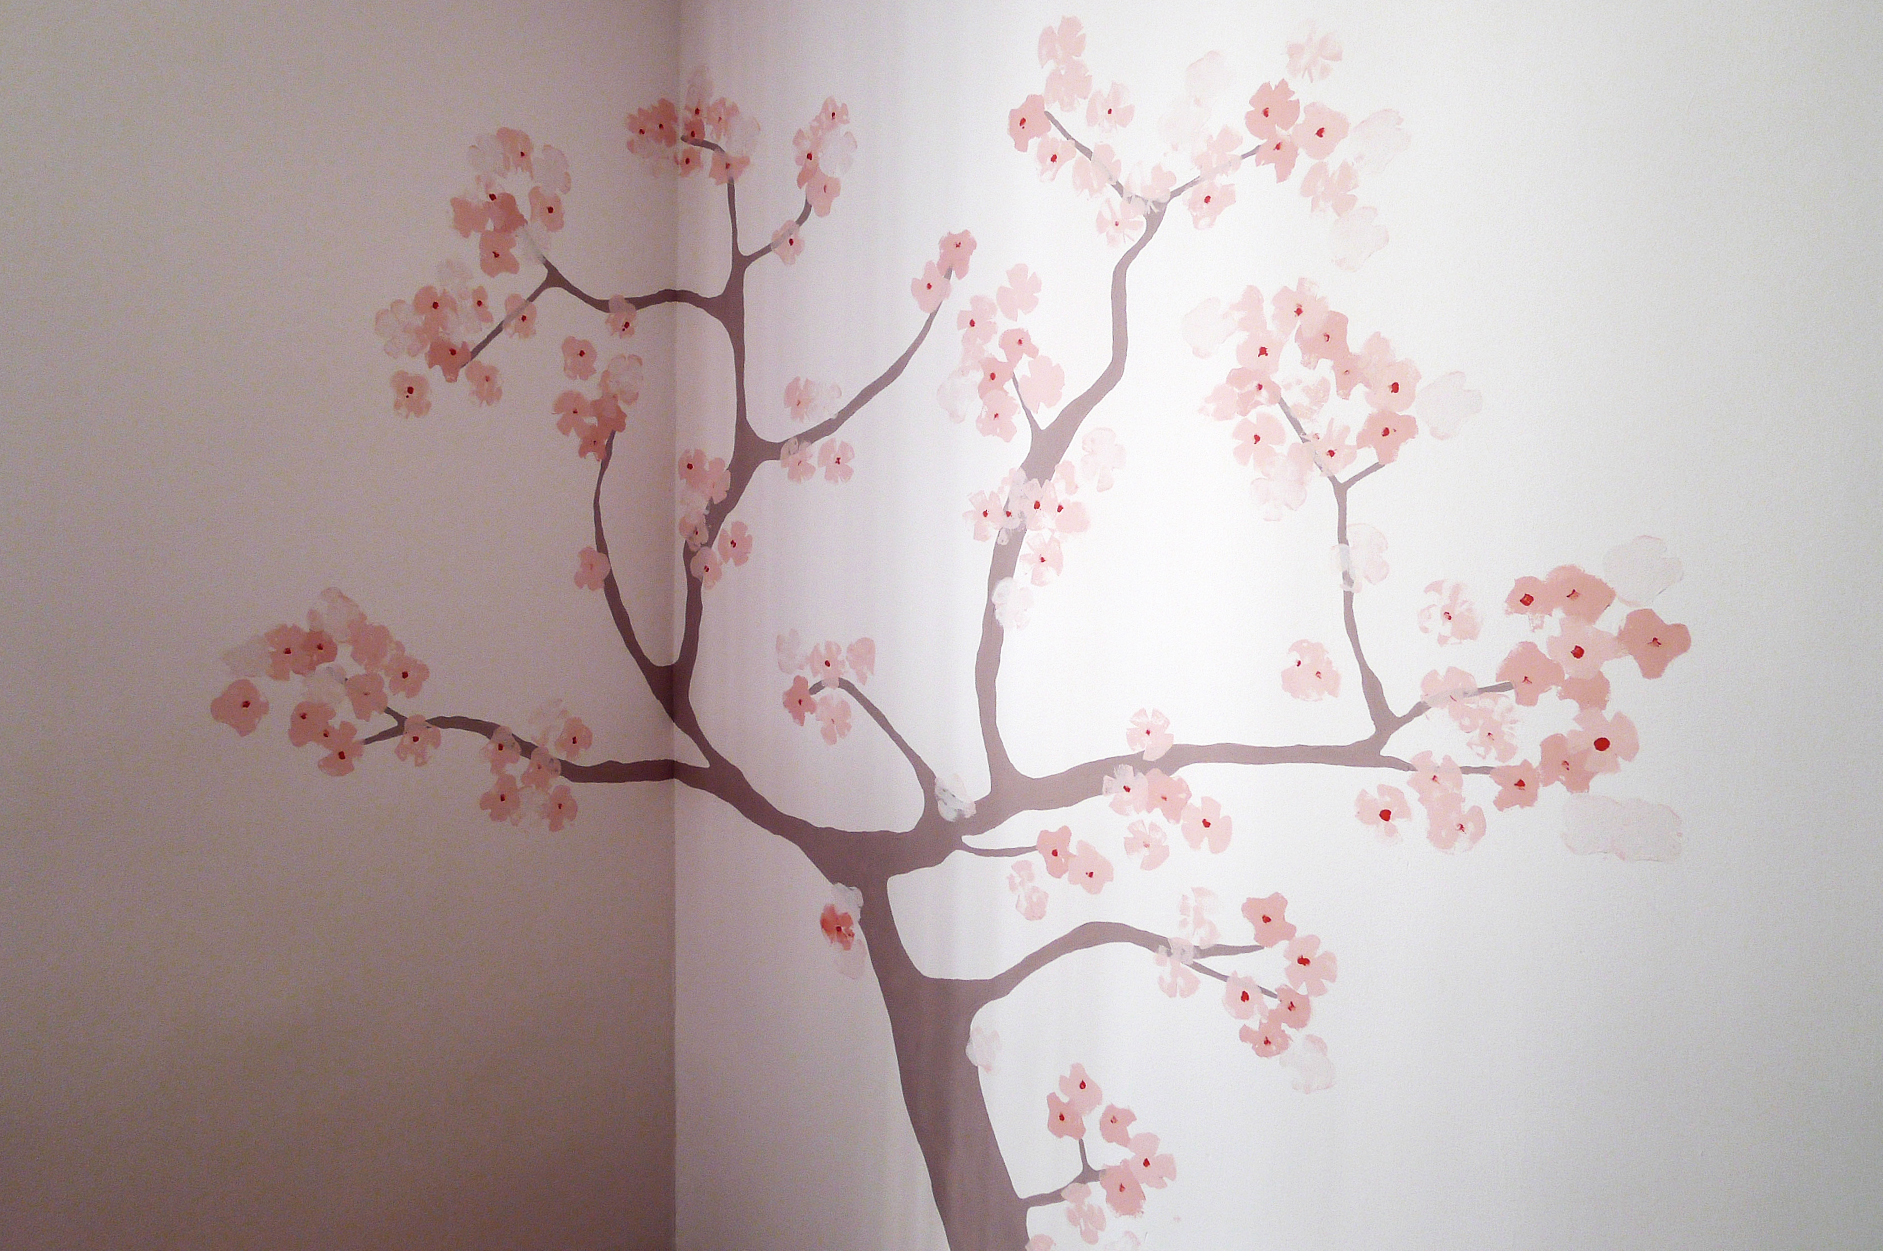 C mo dibujar un rbol de sakura imagui for Como dibujar un mural en la pared